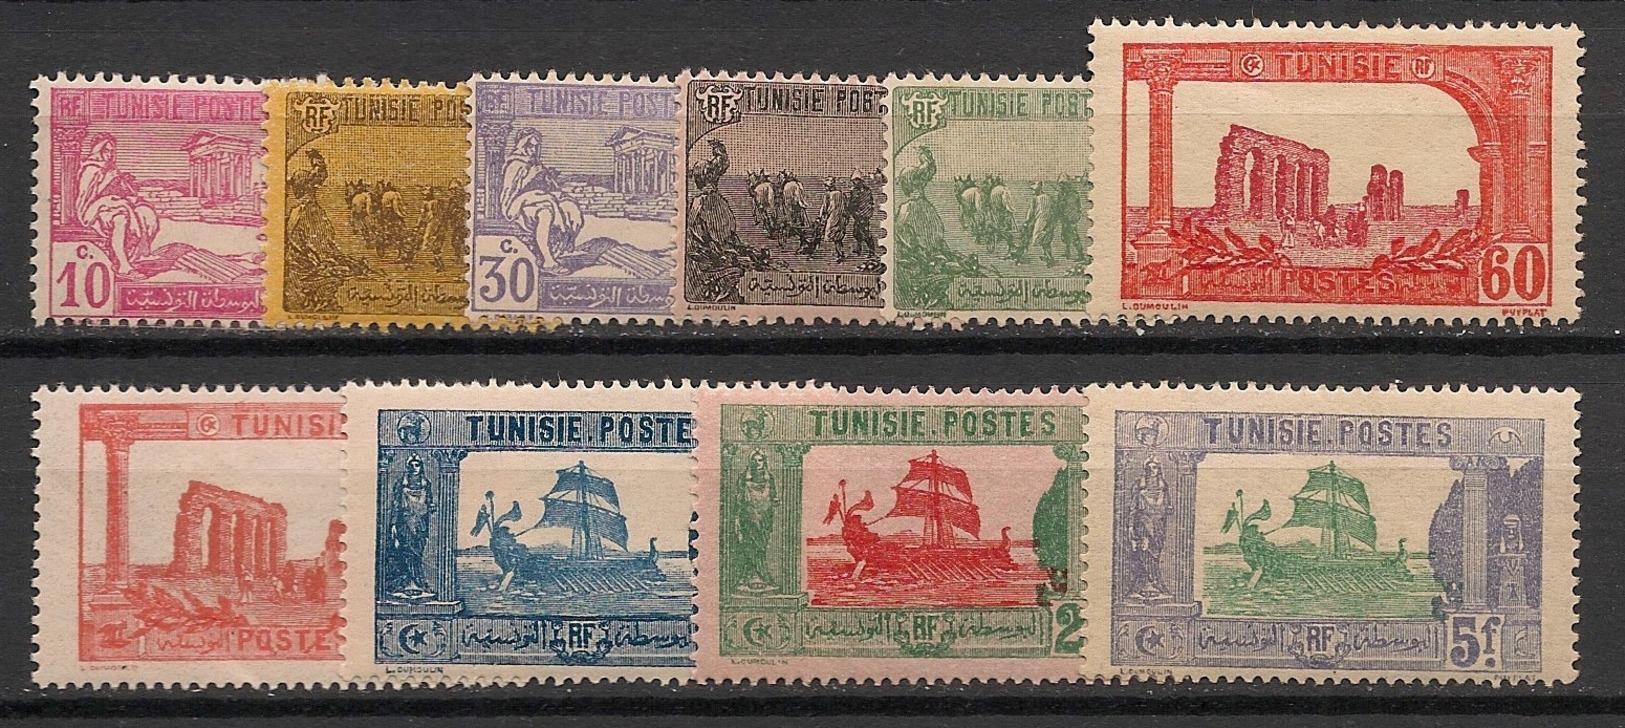 Tunisie - 1923-26 - N°Yv. 100 à 109 - Série Complète - Neuf  Luxe ** / MNH / Postfrisch - Ongebruikt